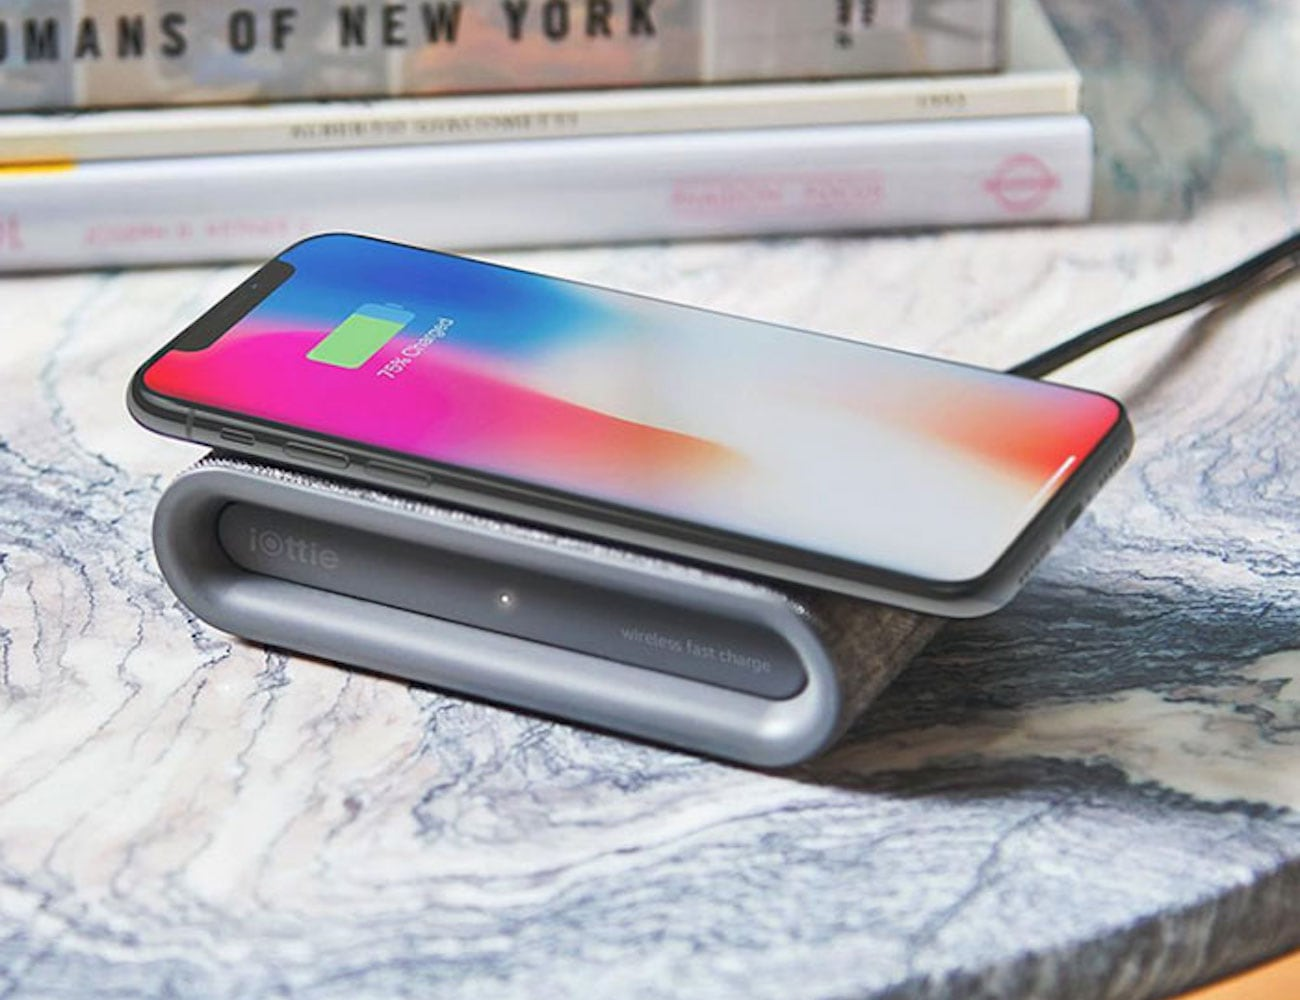 iOttie iON Wireless Plus USB-C Fast Charging Pad